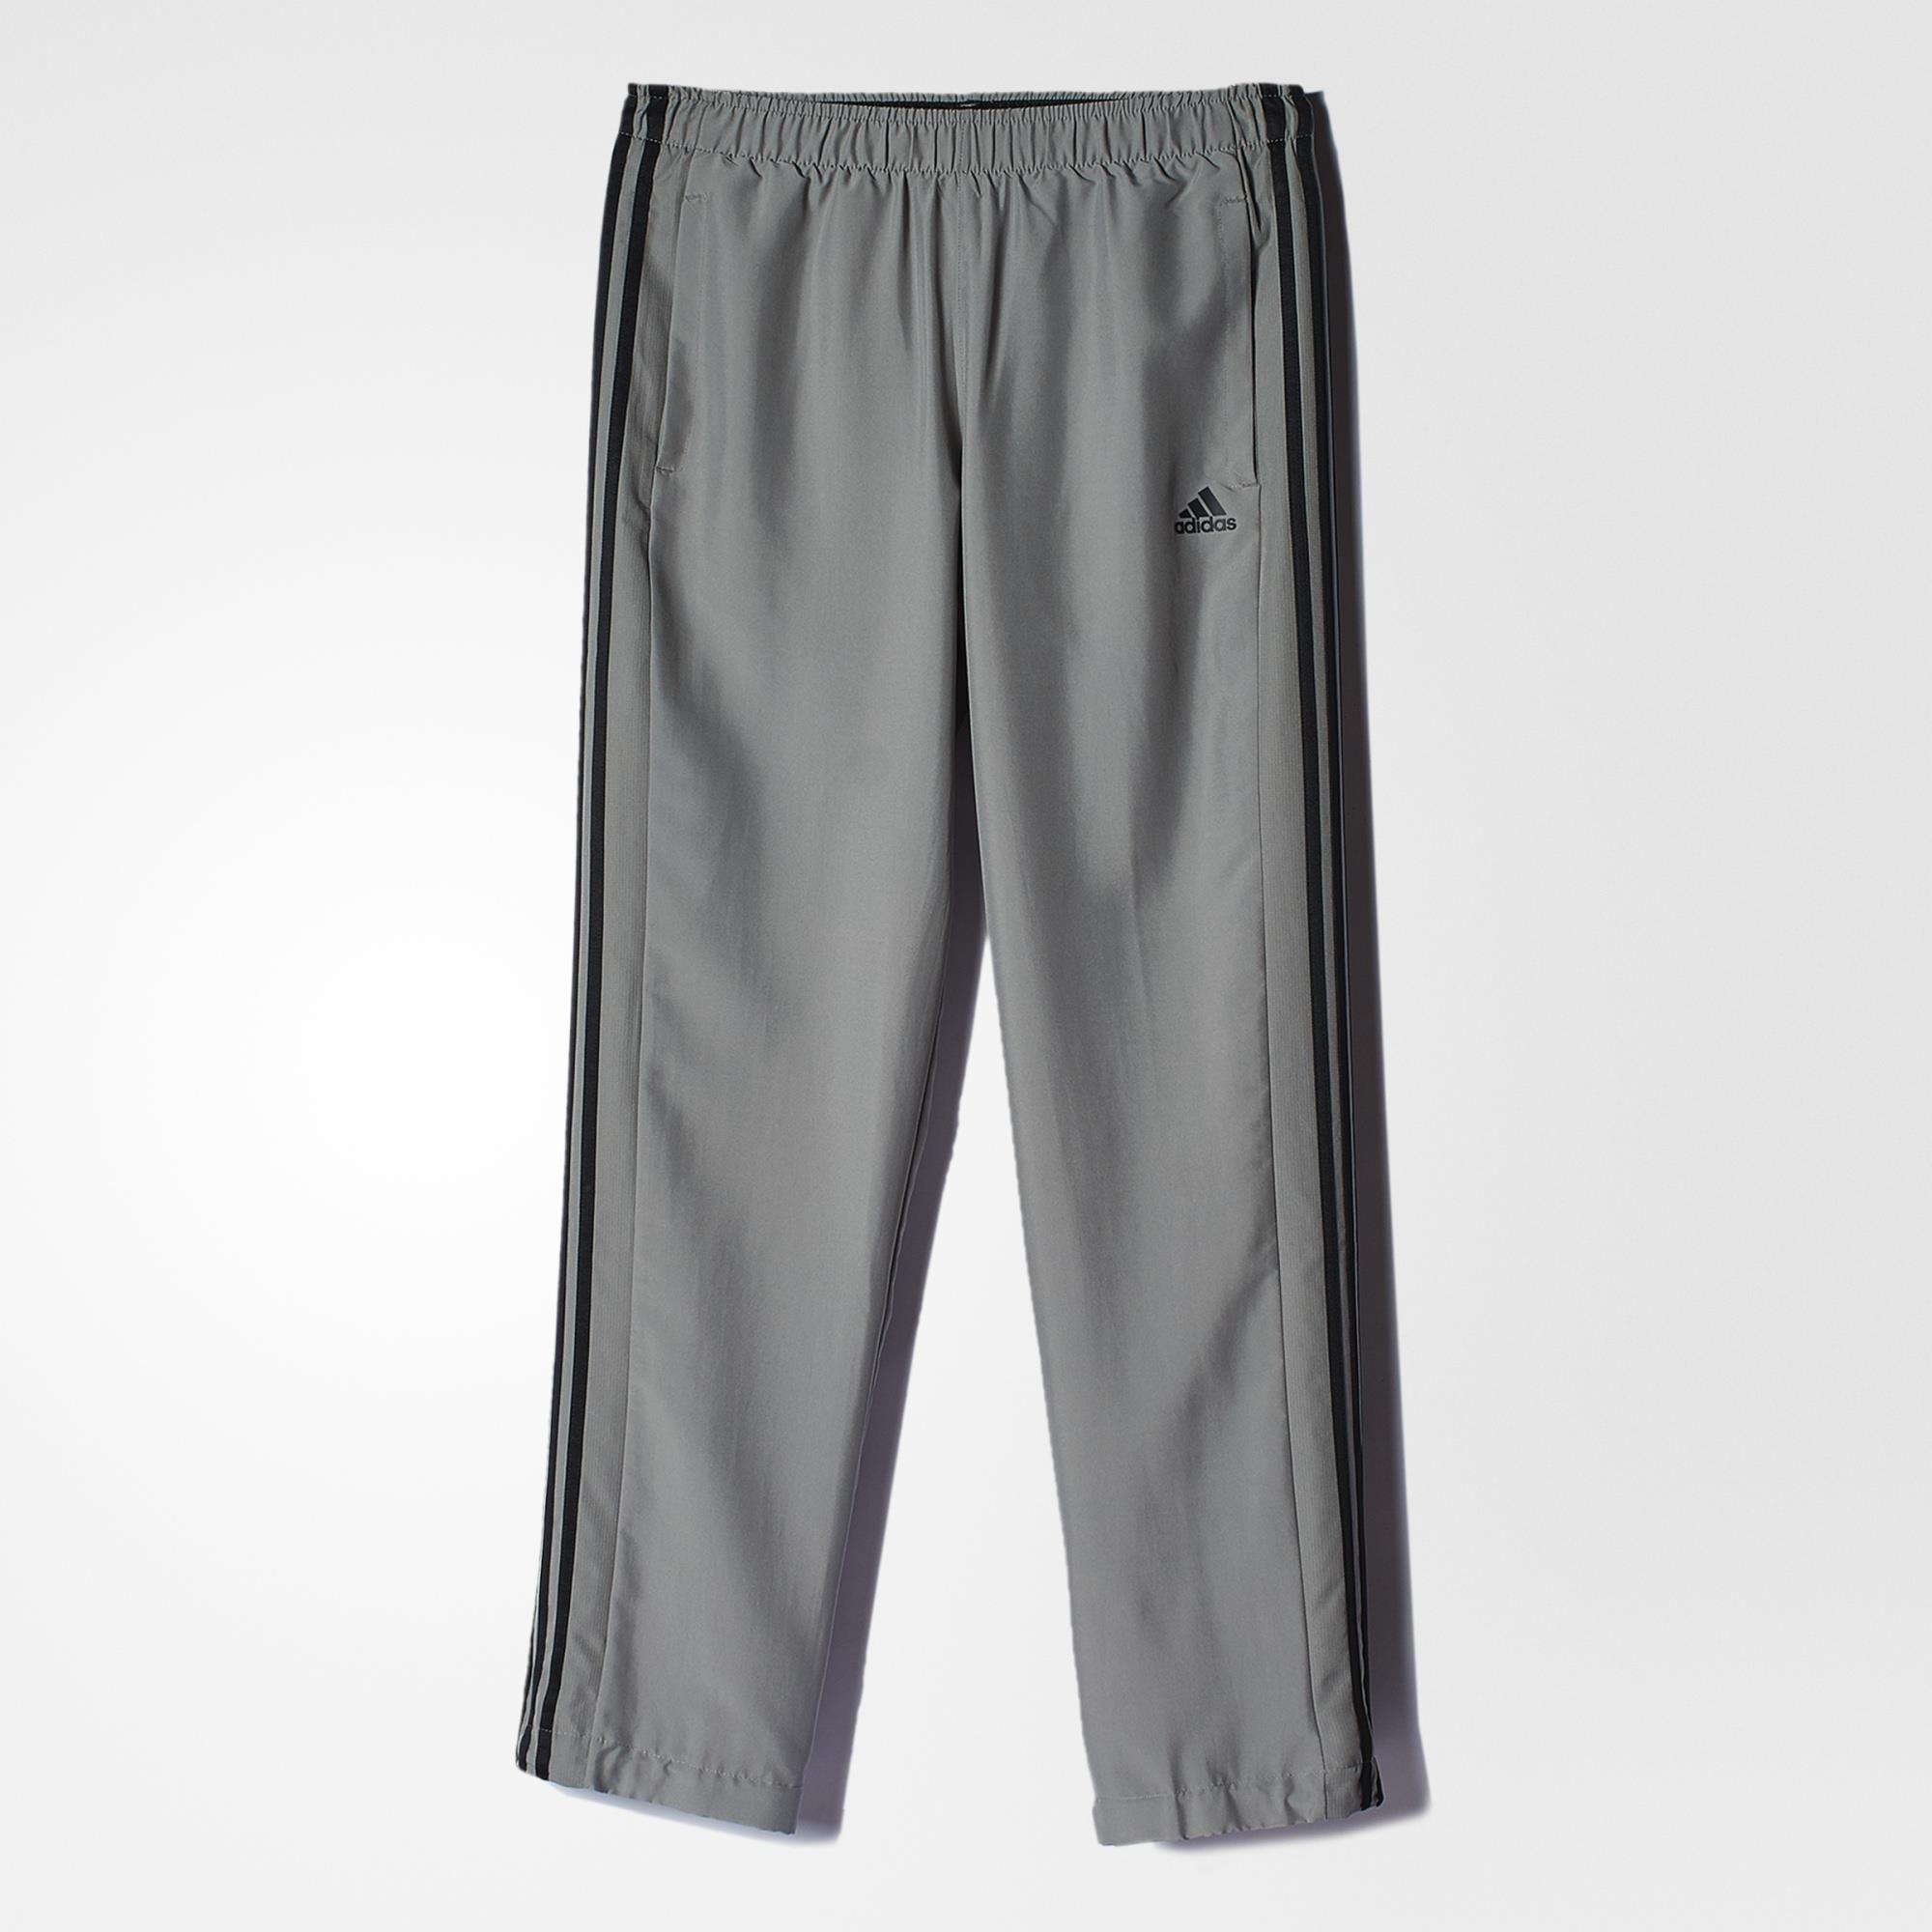 hasta ahora verano bordado  Pantalon Adidas Training Microfibra Gris Negro - Indumentaria - Hombres -  E-Shop